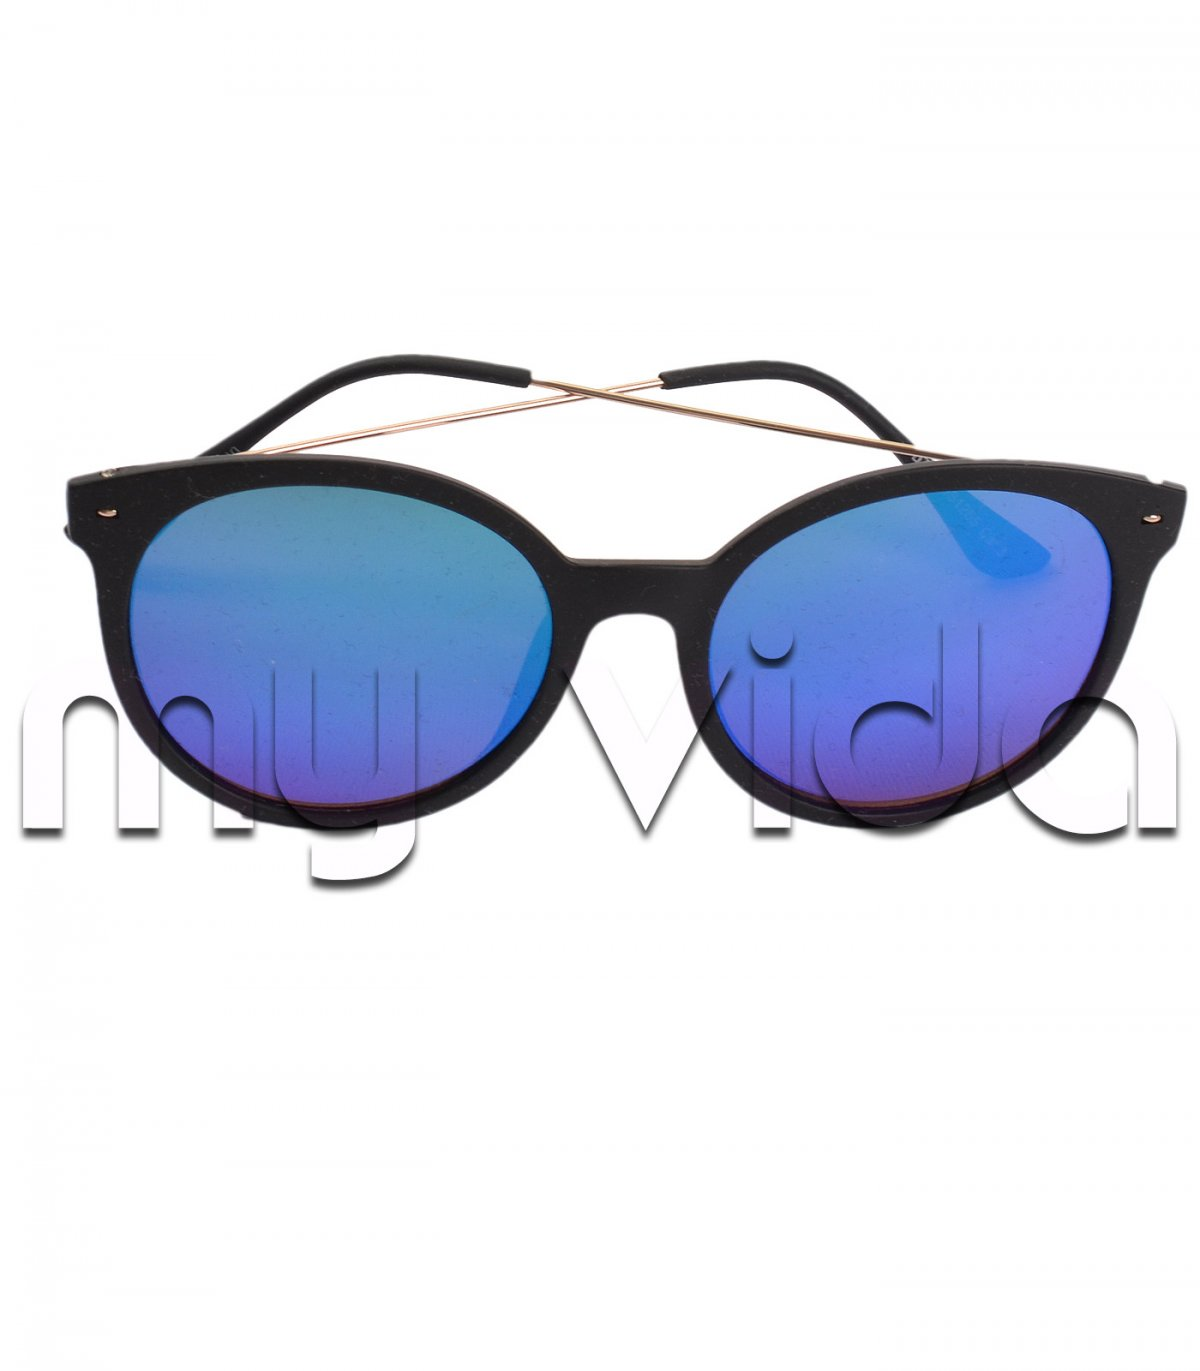 Occhiali donna lenti blu my vida - Occhiali lenti blu specchio ...